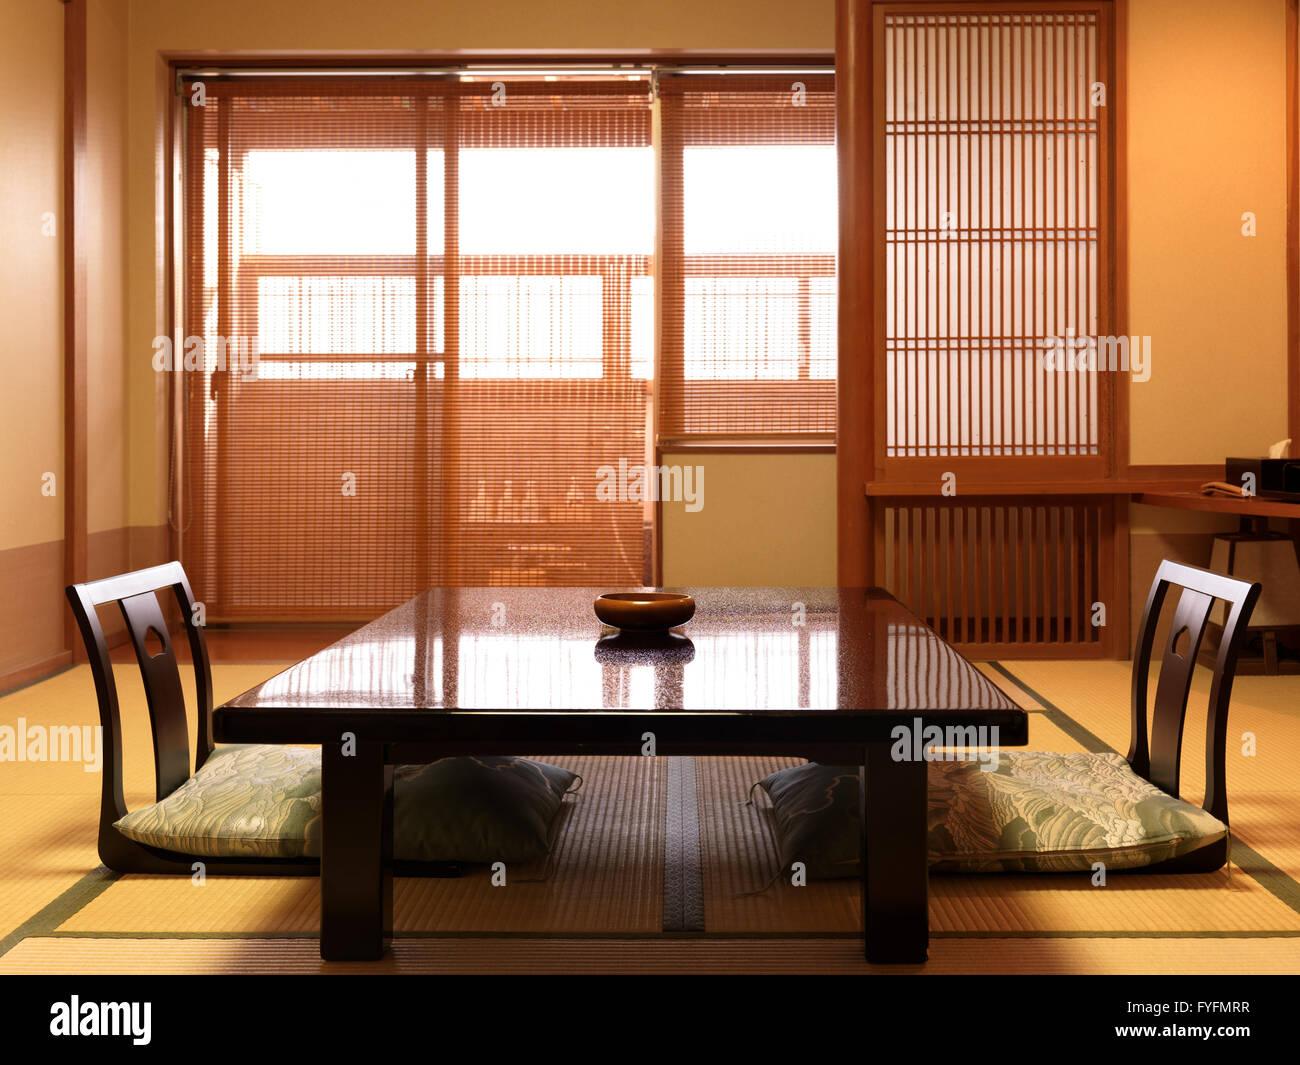 Chabudai Tea Table And Zaisu Legless Chairs At Traditional Japanese Room Of  A Ryokan Hotel,